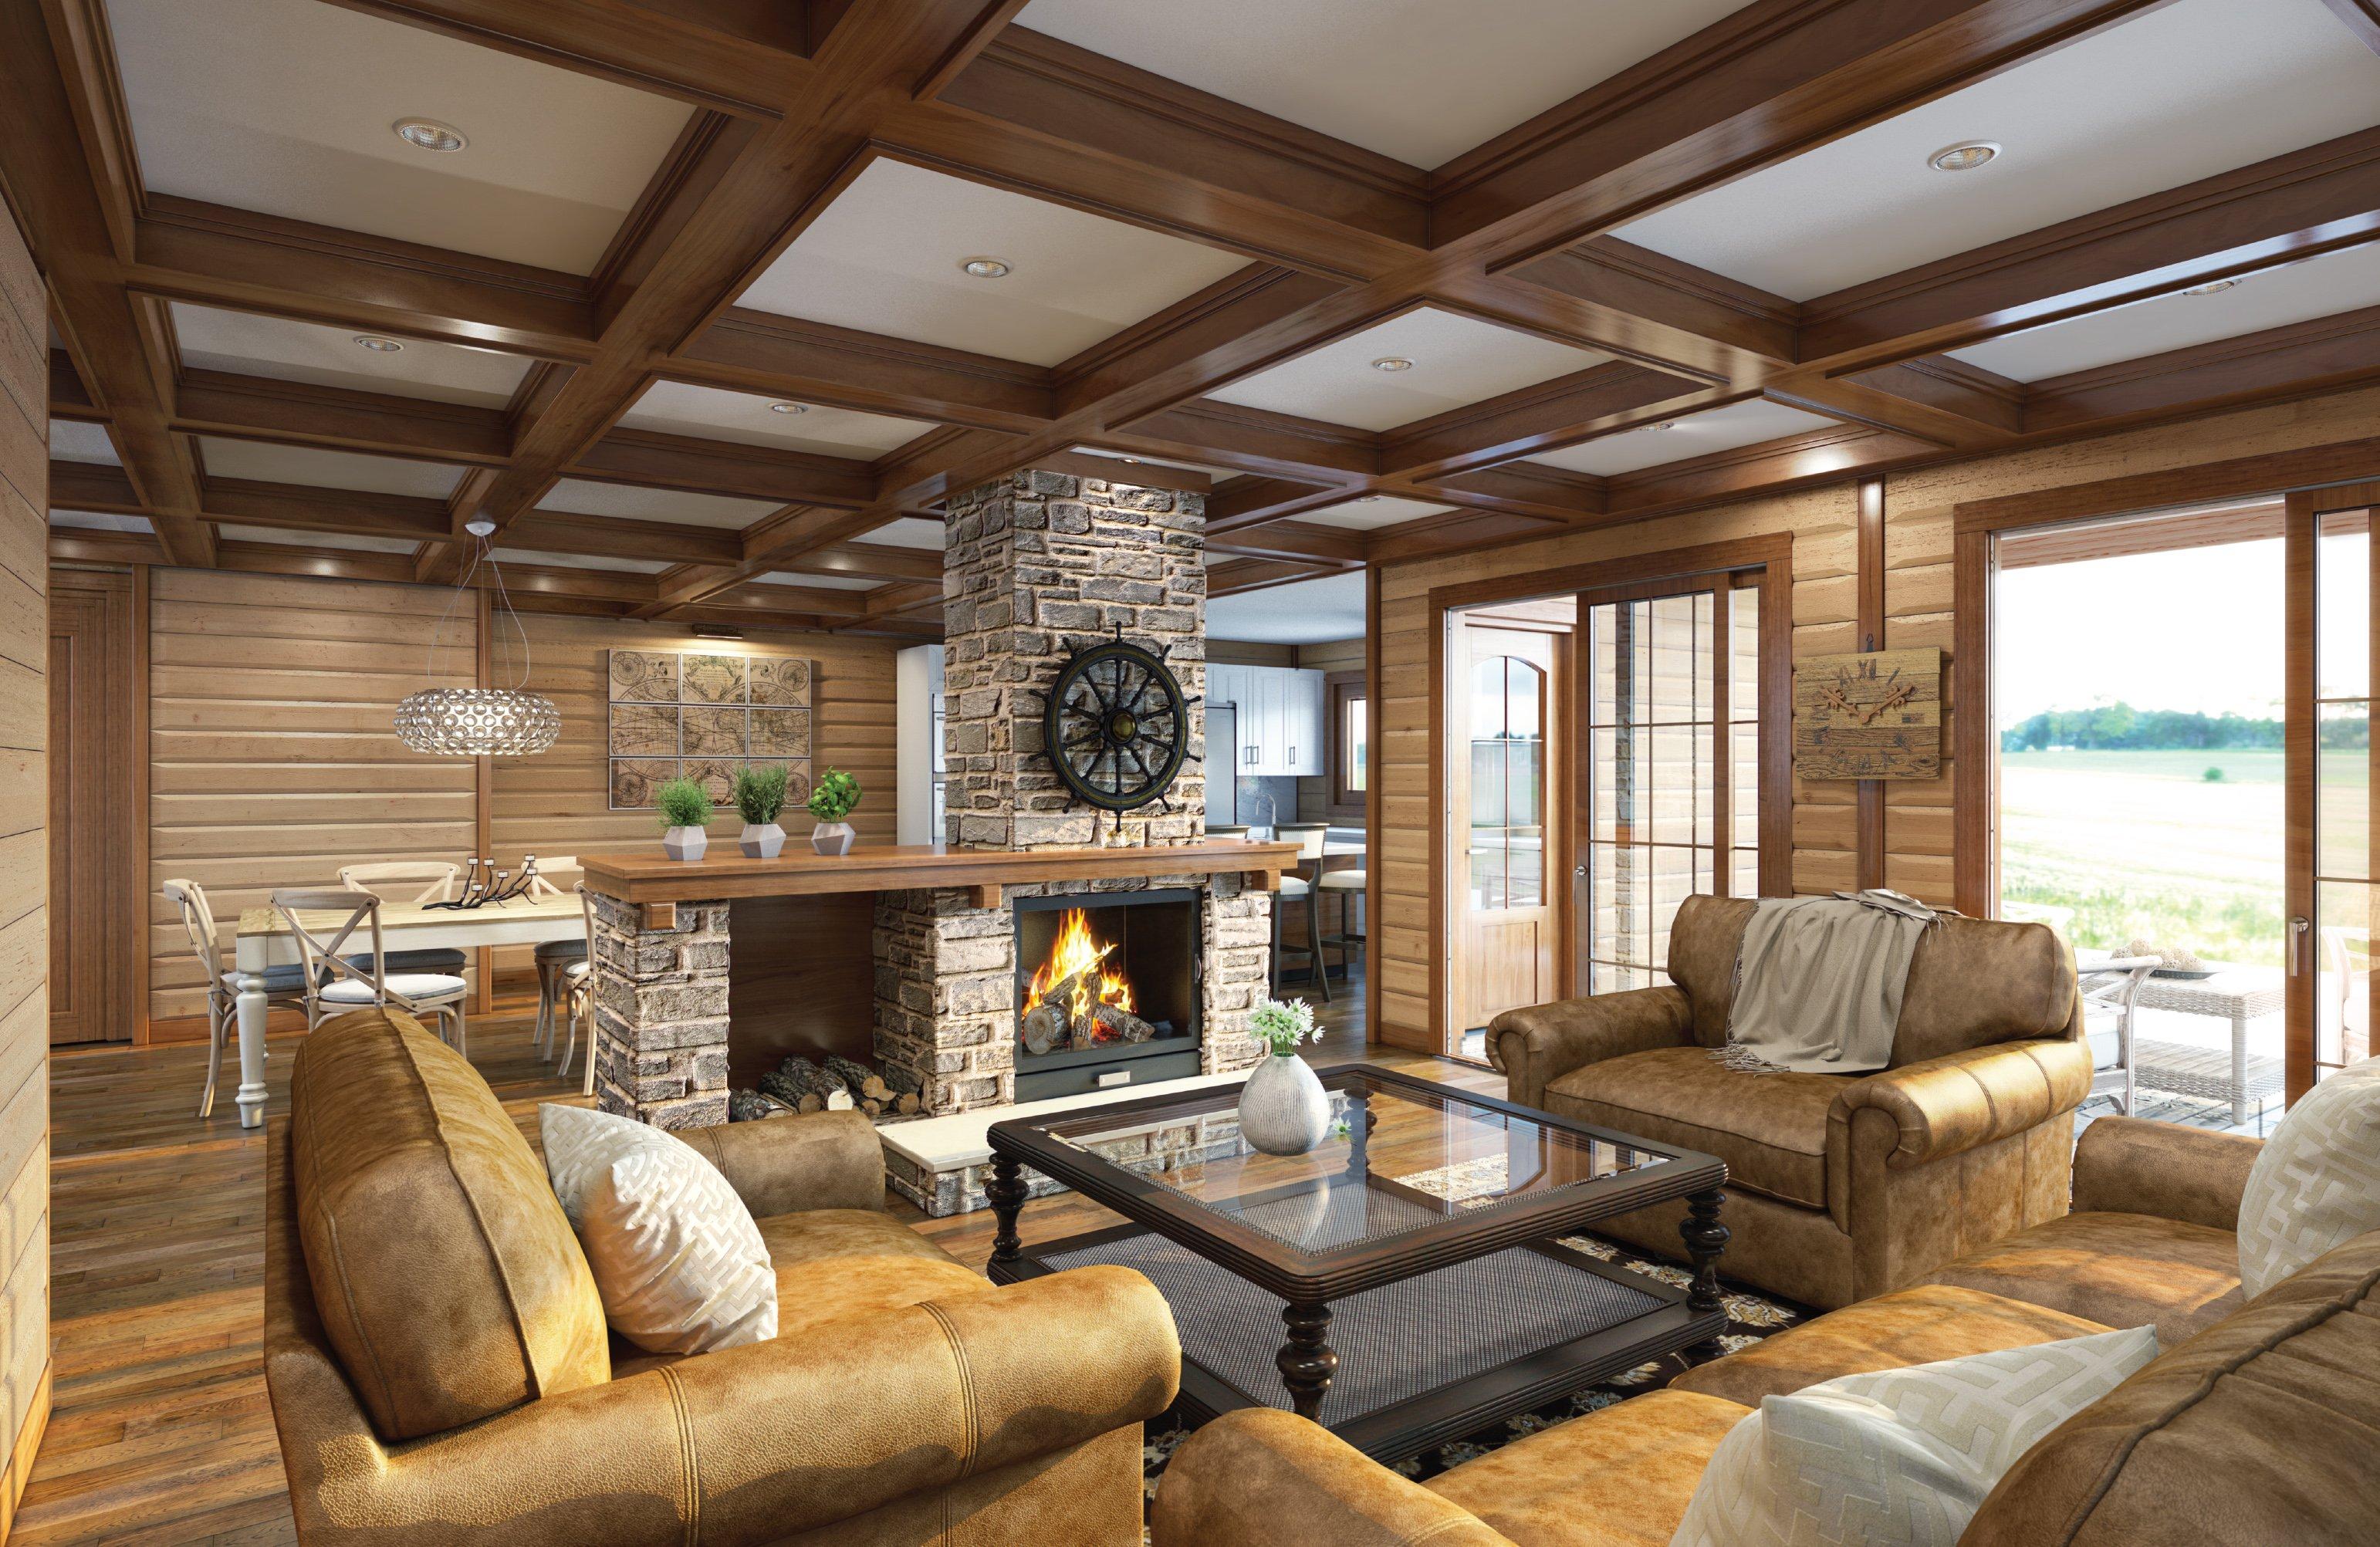 Timber Block whistler home interior